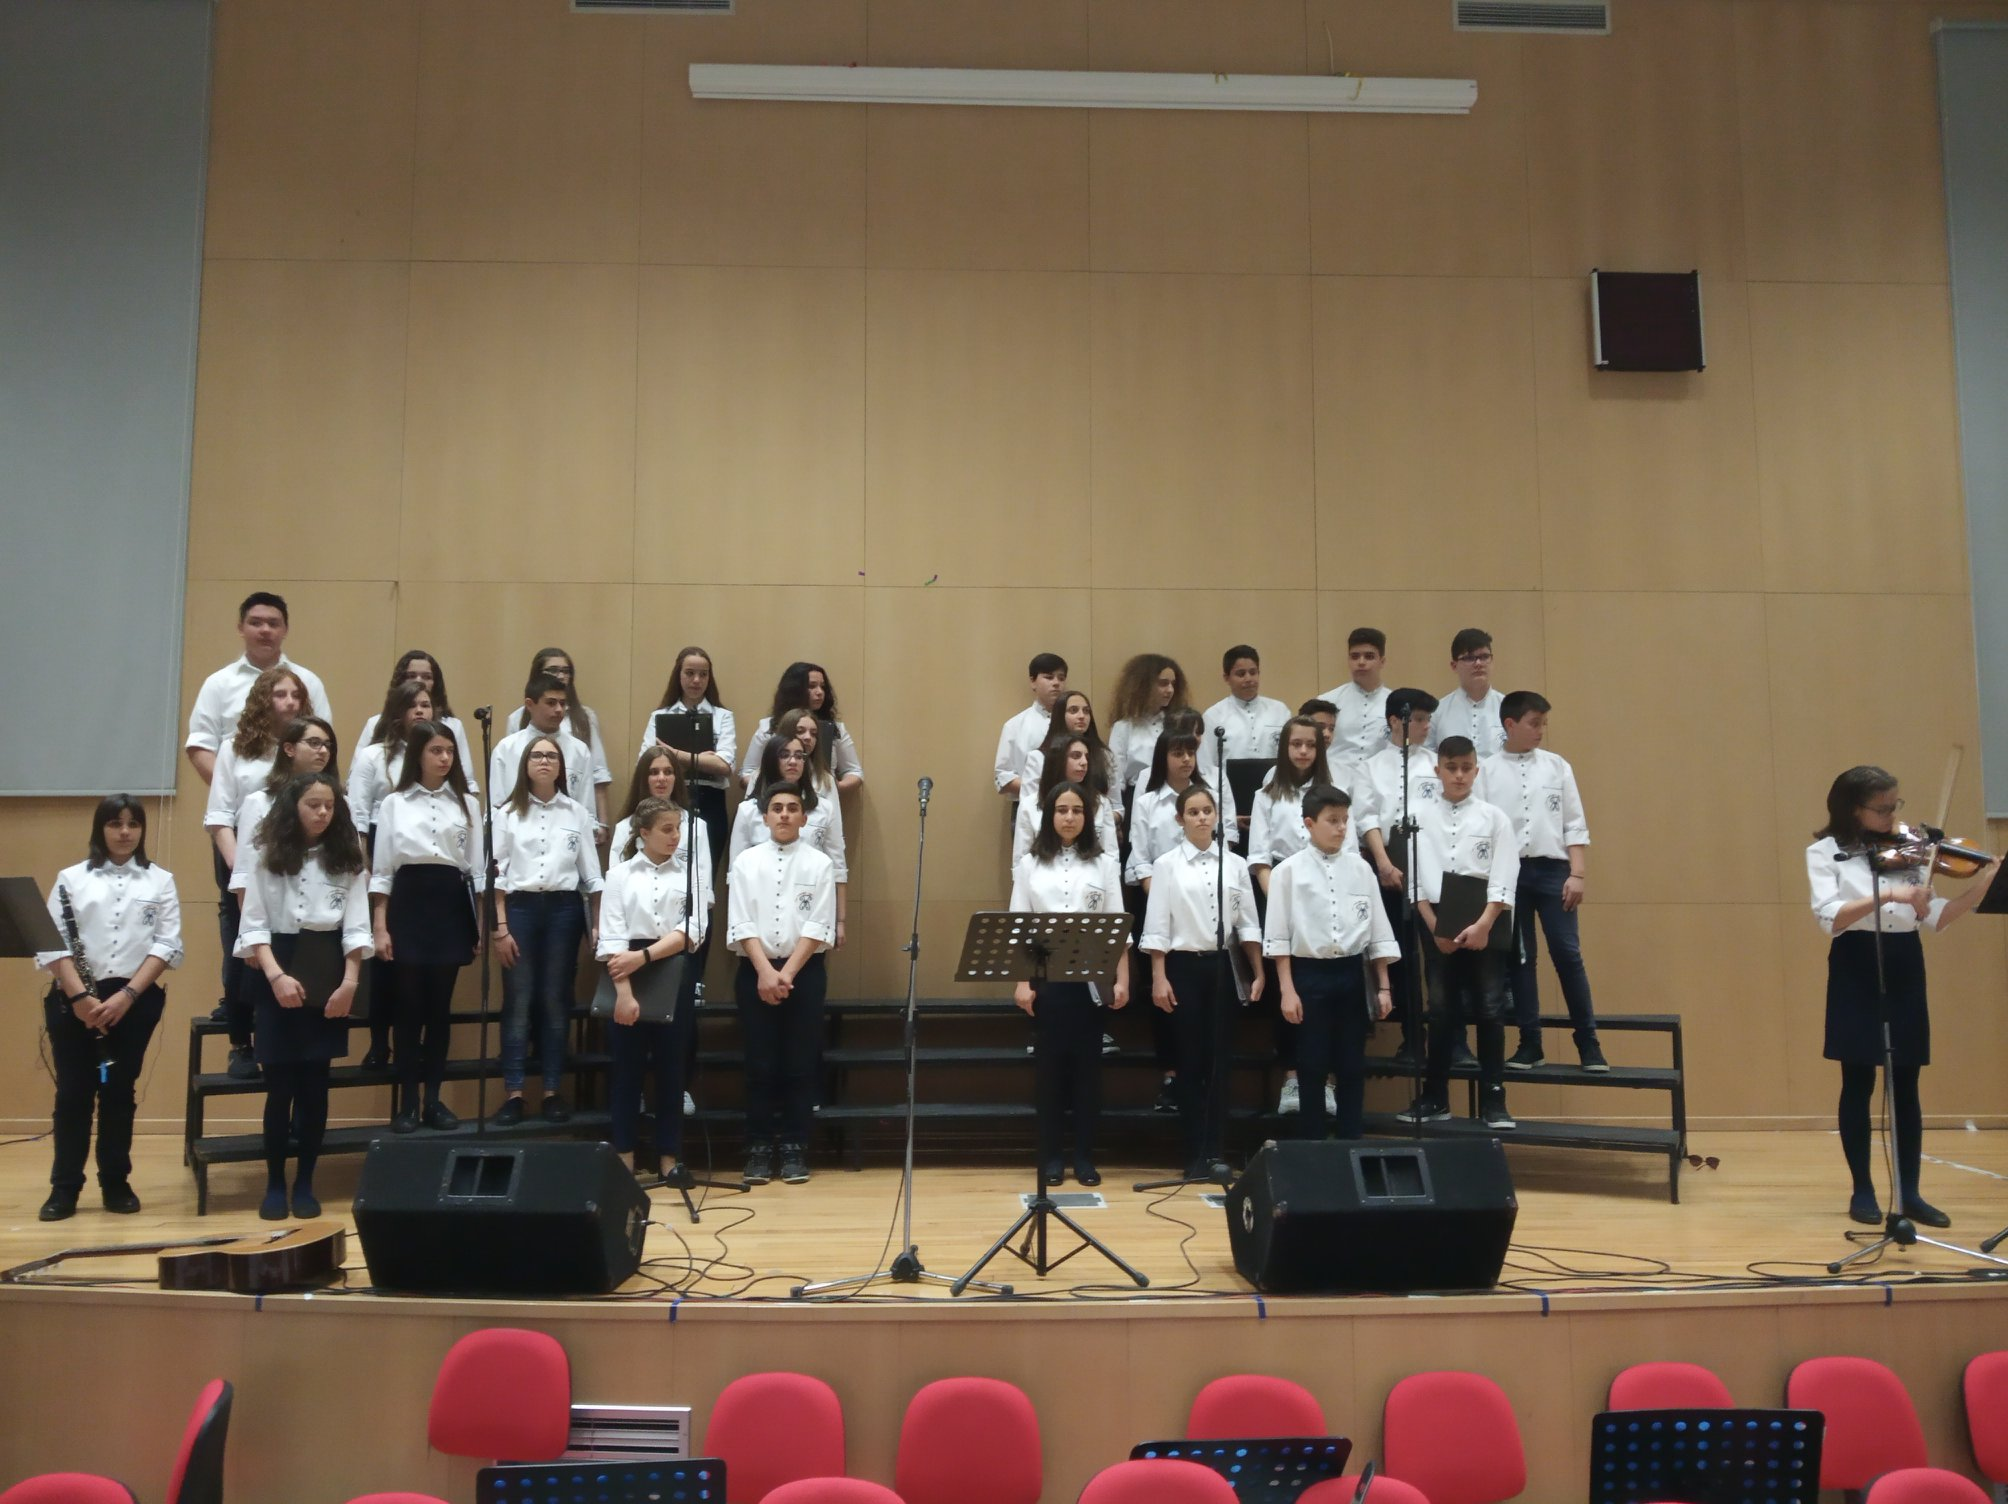 f86f0212eb5 Μια εξαιρετική μουσική εκδήλωση πραγματοποιήθηκε απόψε στο αμφιθέατρο του  ΤΕΙ Καστοριάς. Δύο Μουσικά Σχολεία, της Καστοριάς και της Πάτρας, και δύο  χορωδίες ...